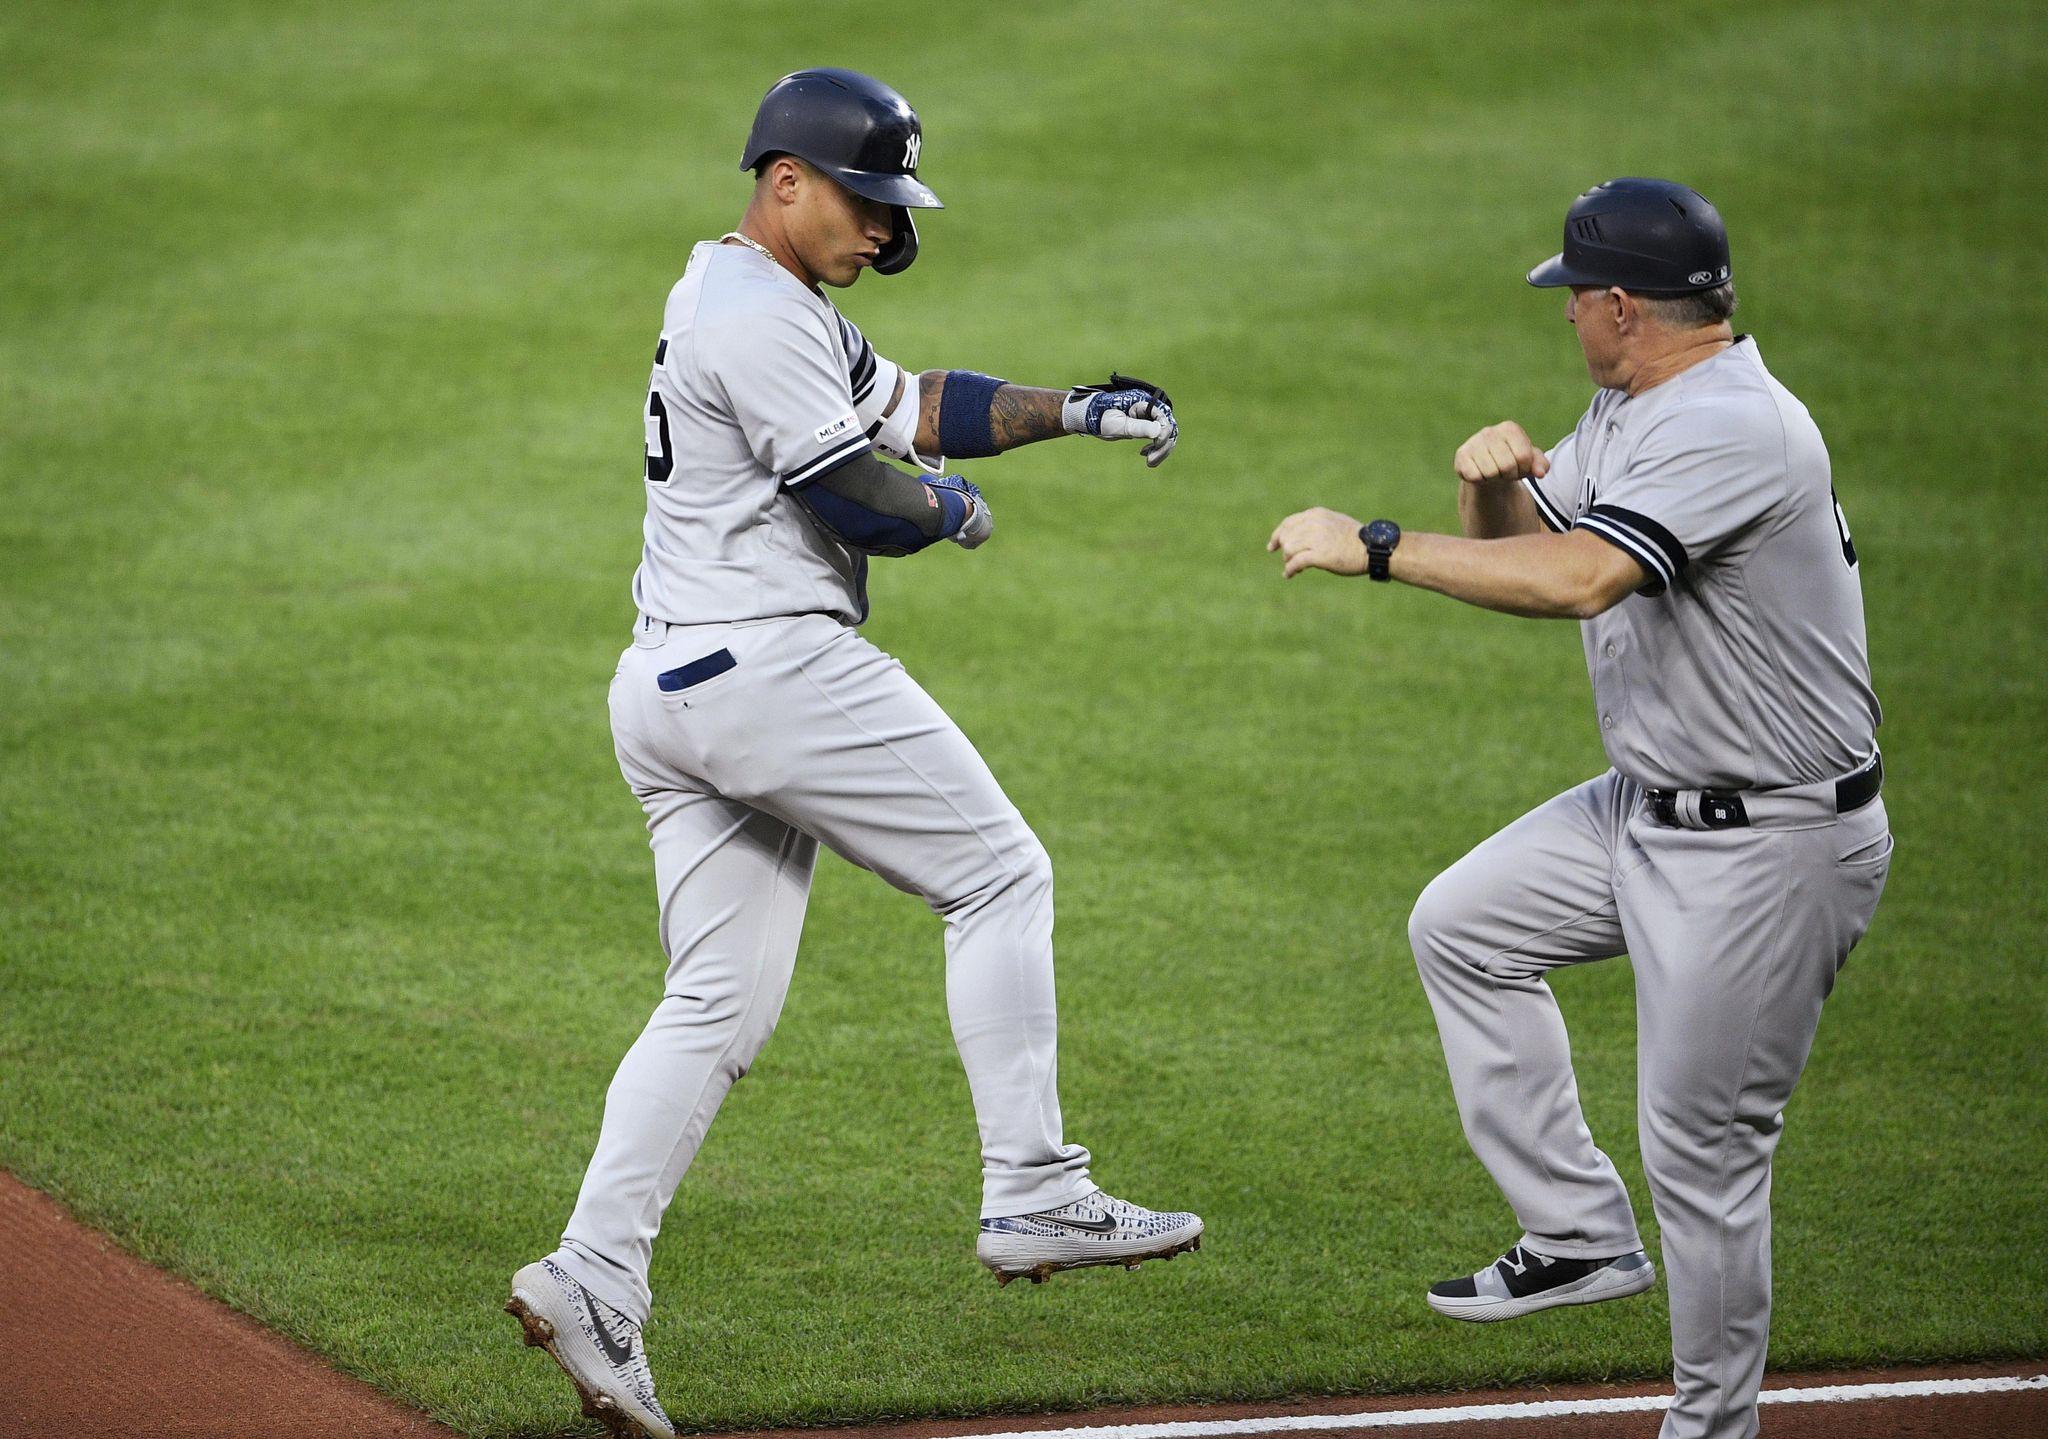 Yankees_orioles_baseball_65880_s2048x1439